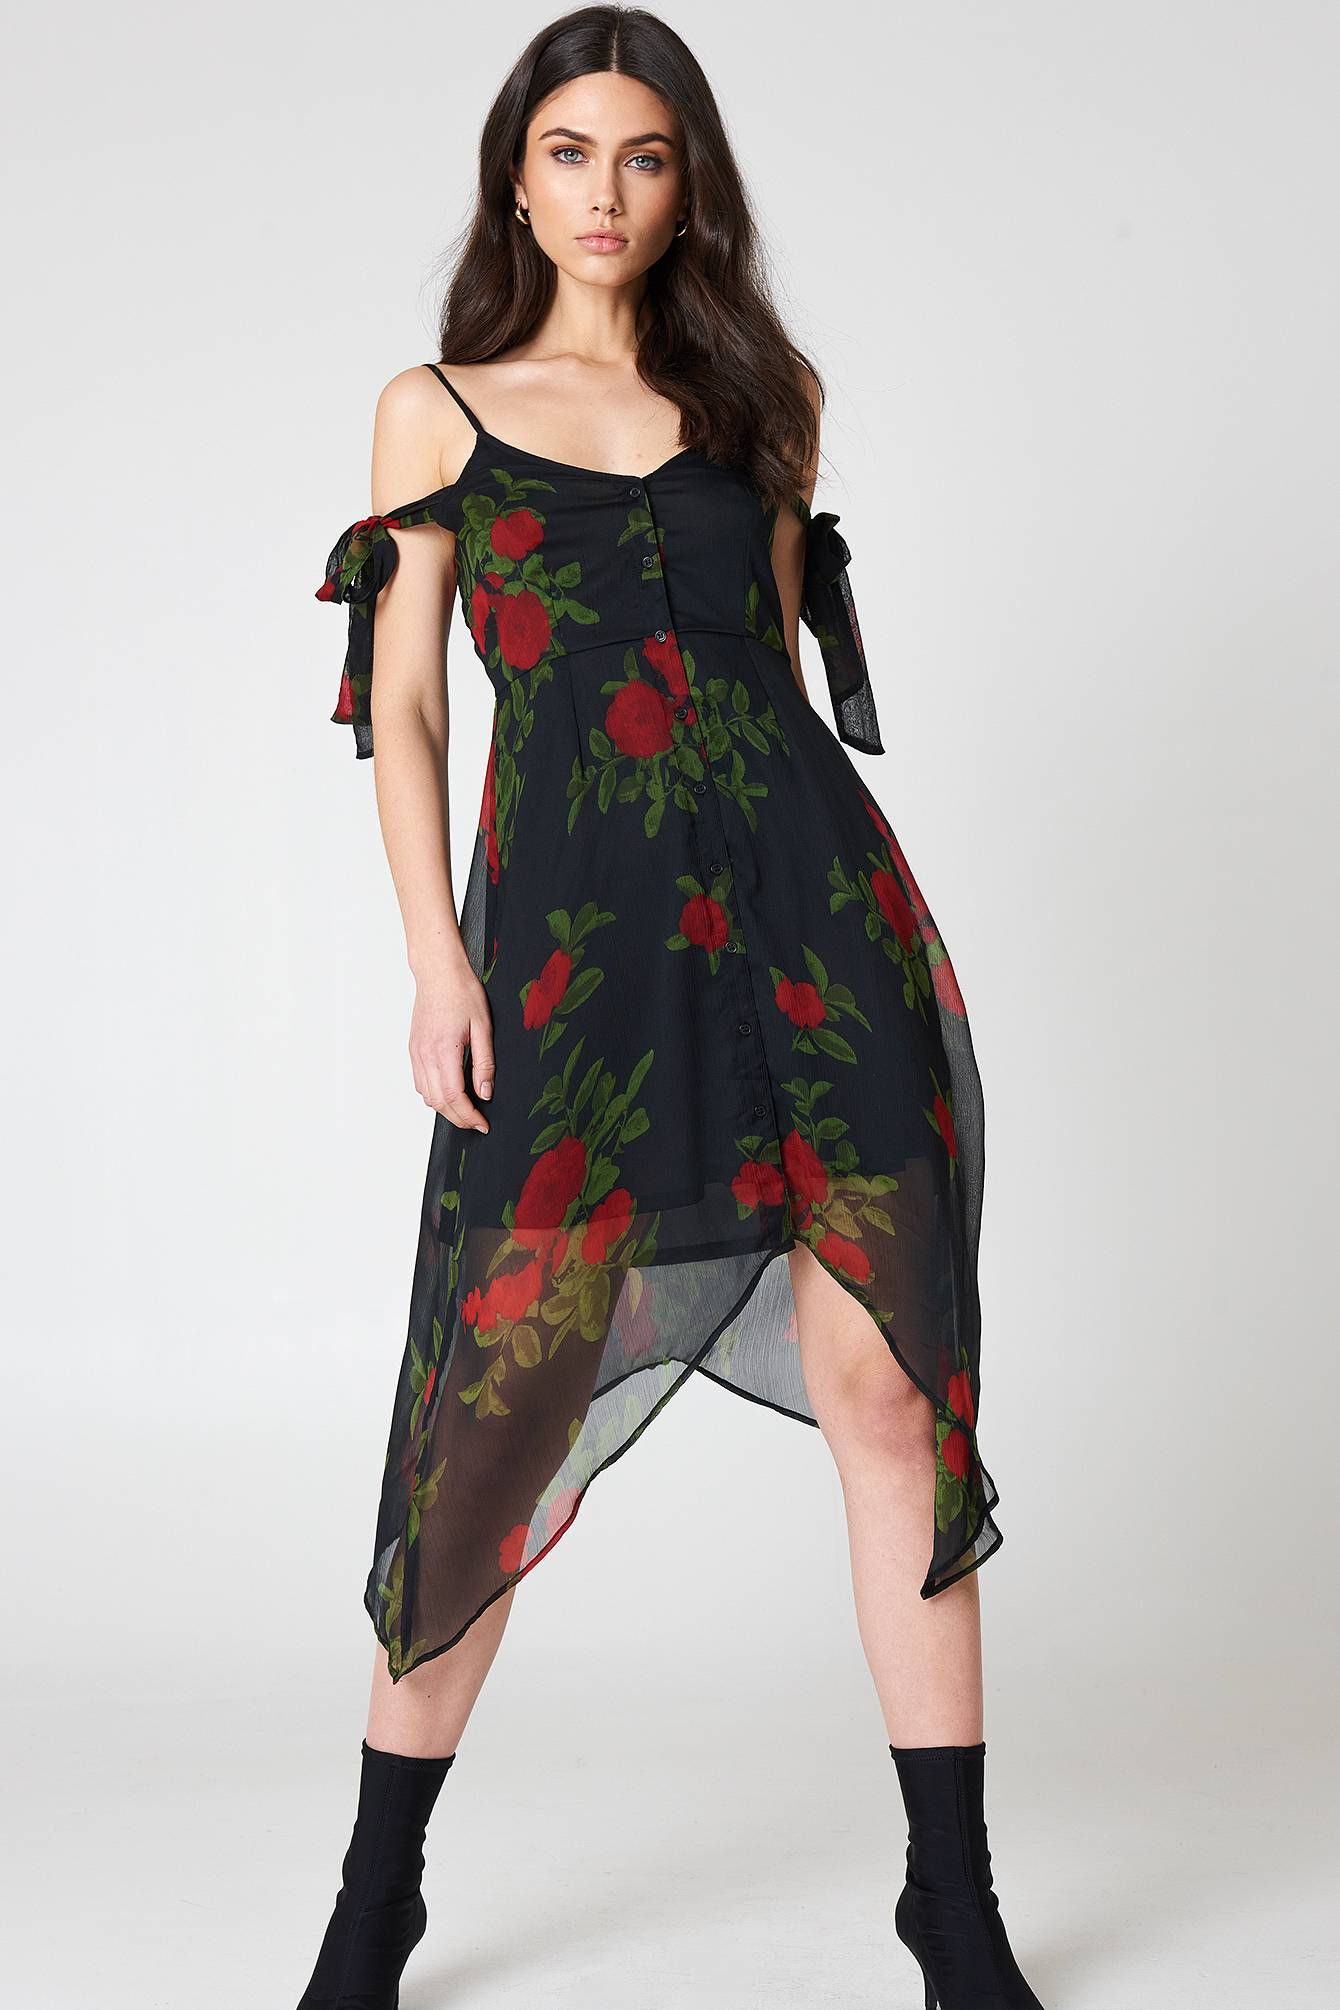 Image of NA-KD Boho Knot Detail Midi Dress - Black,Multicolor